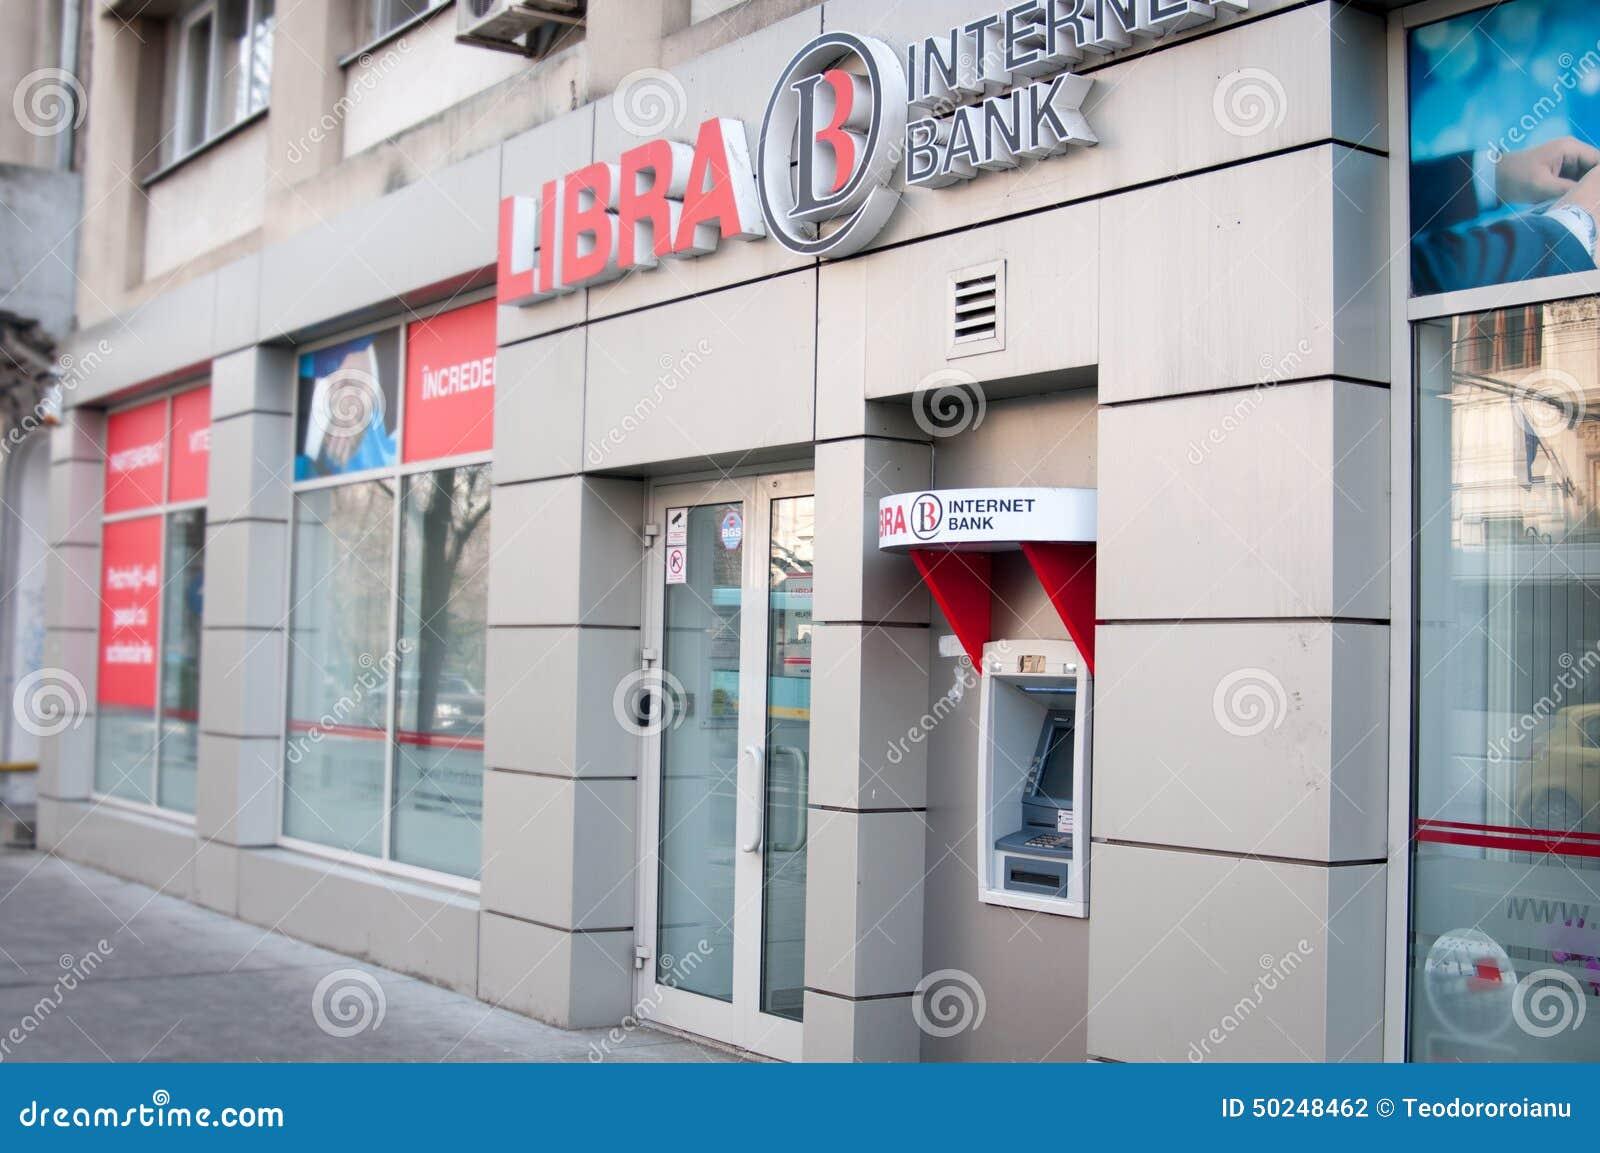 Libra internet bank branch